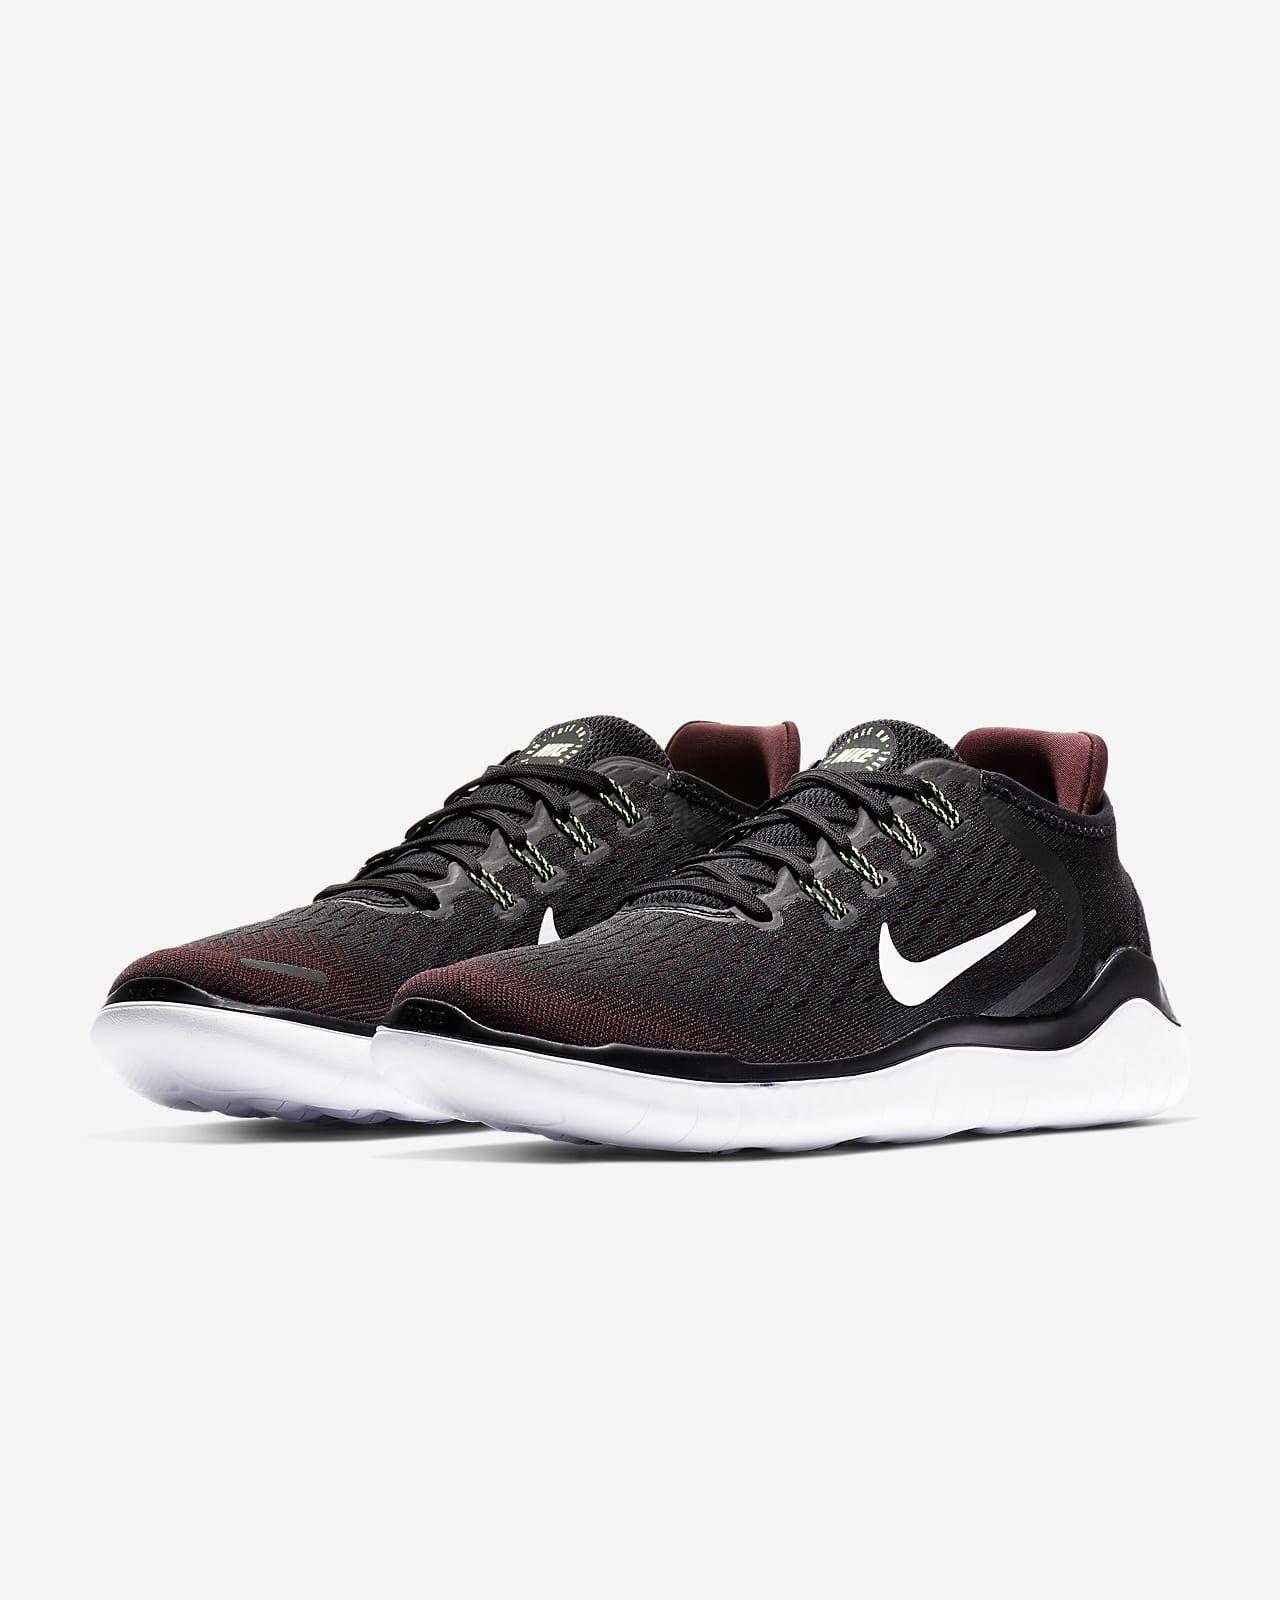 Motel Delegar télex  Calzado de running para hombre Nike Free RN 2018. Nike.com